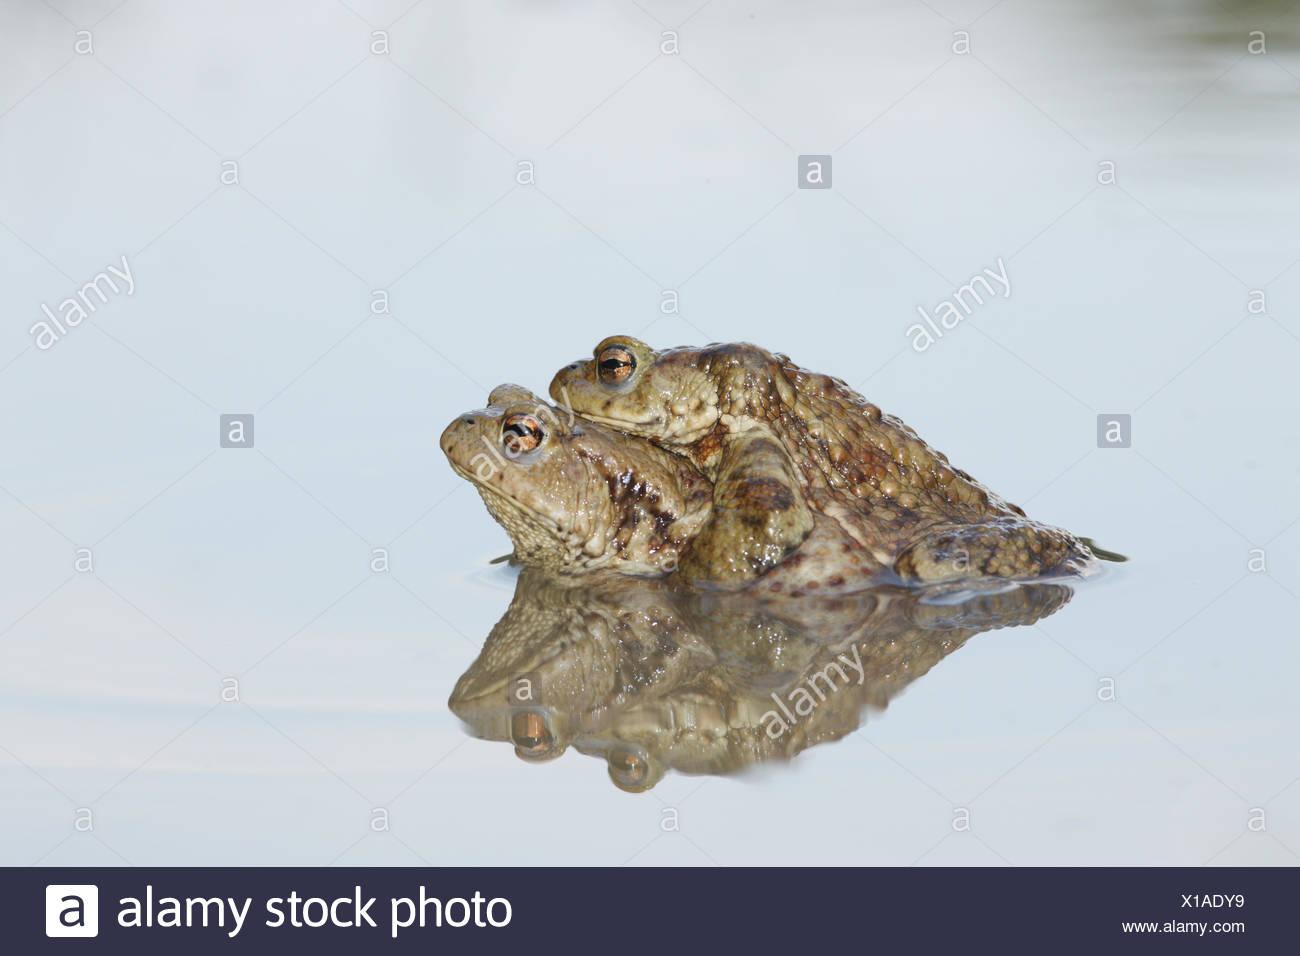 Erdkröten, Bufo bufo, in passender Position genannt Amplexus. Stockbild